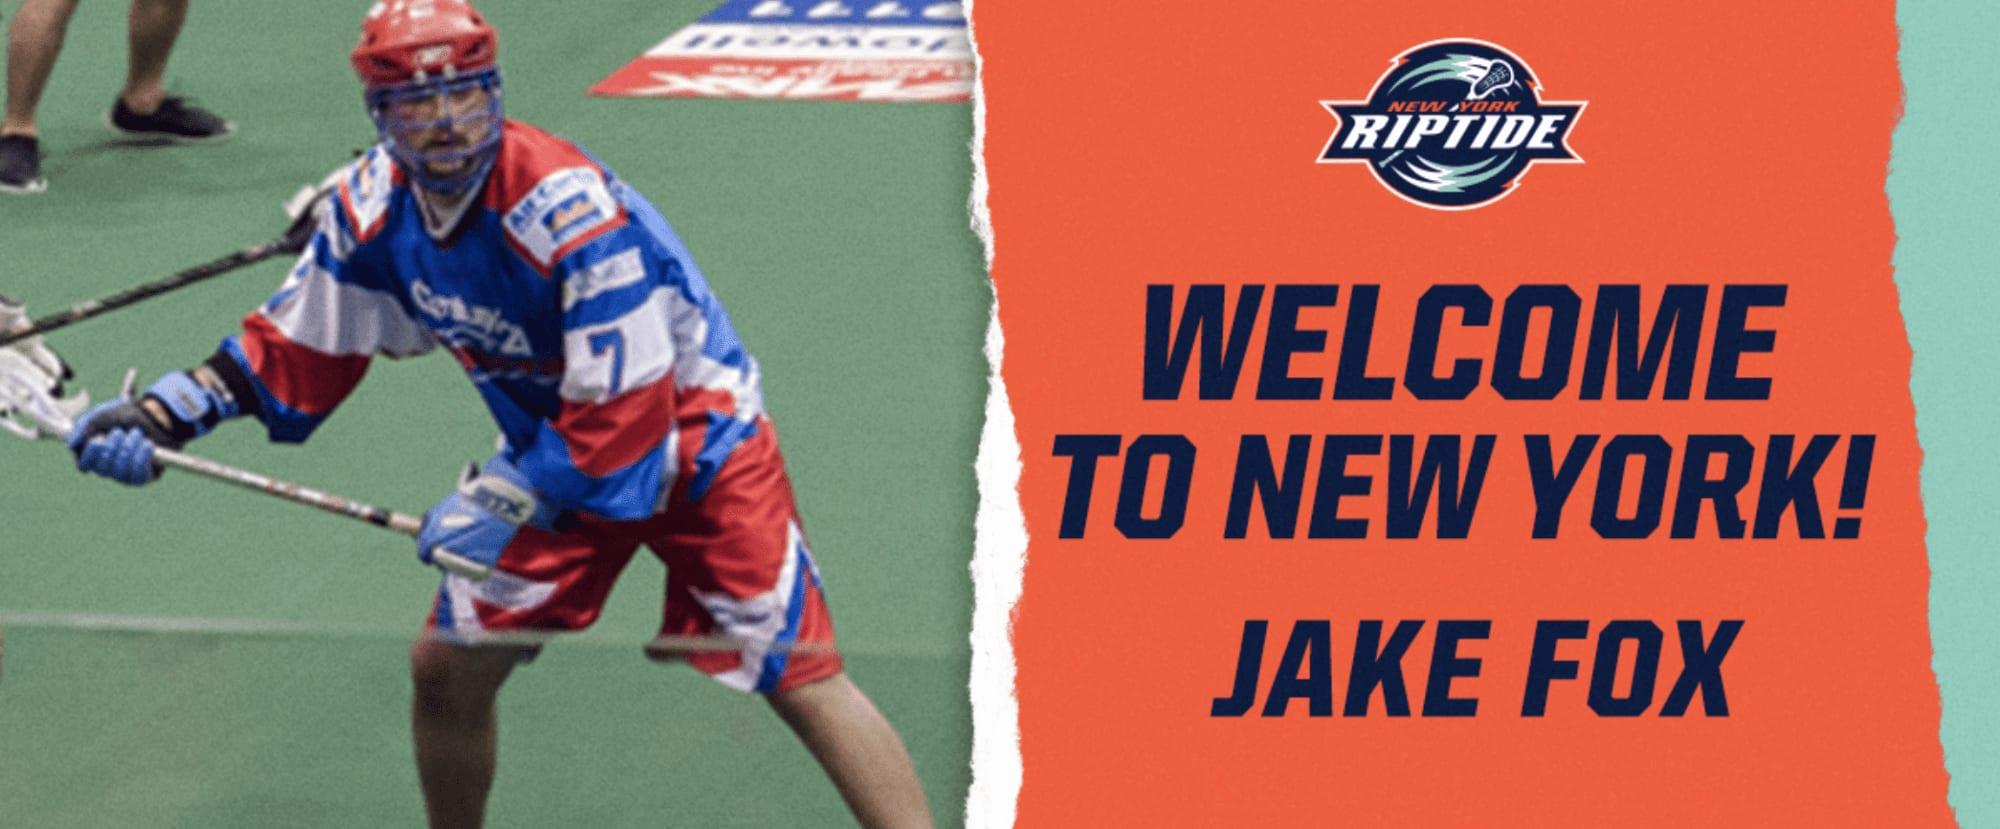 new york riptide jake fox nll national lacrosse league